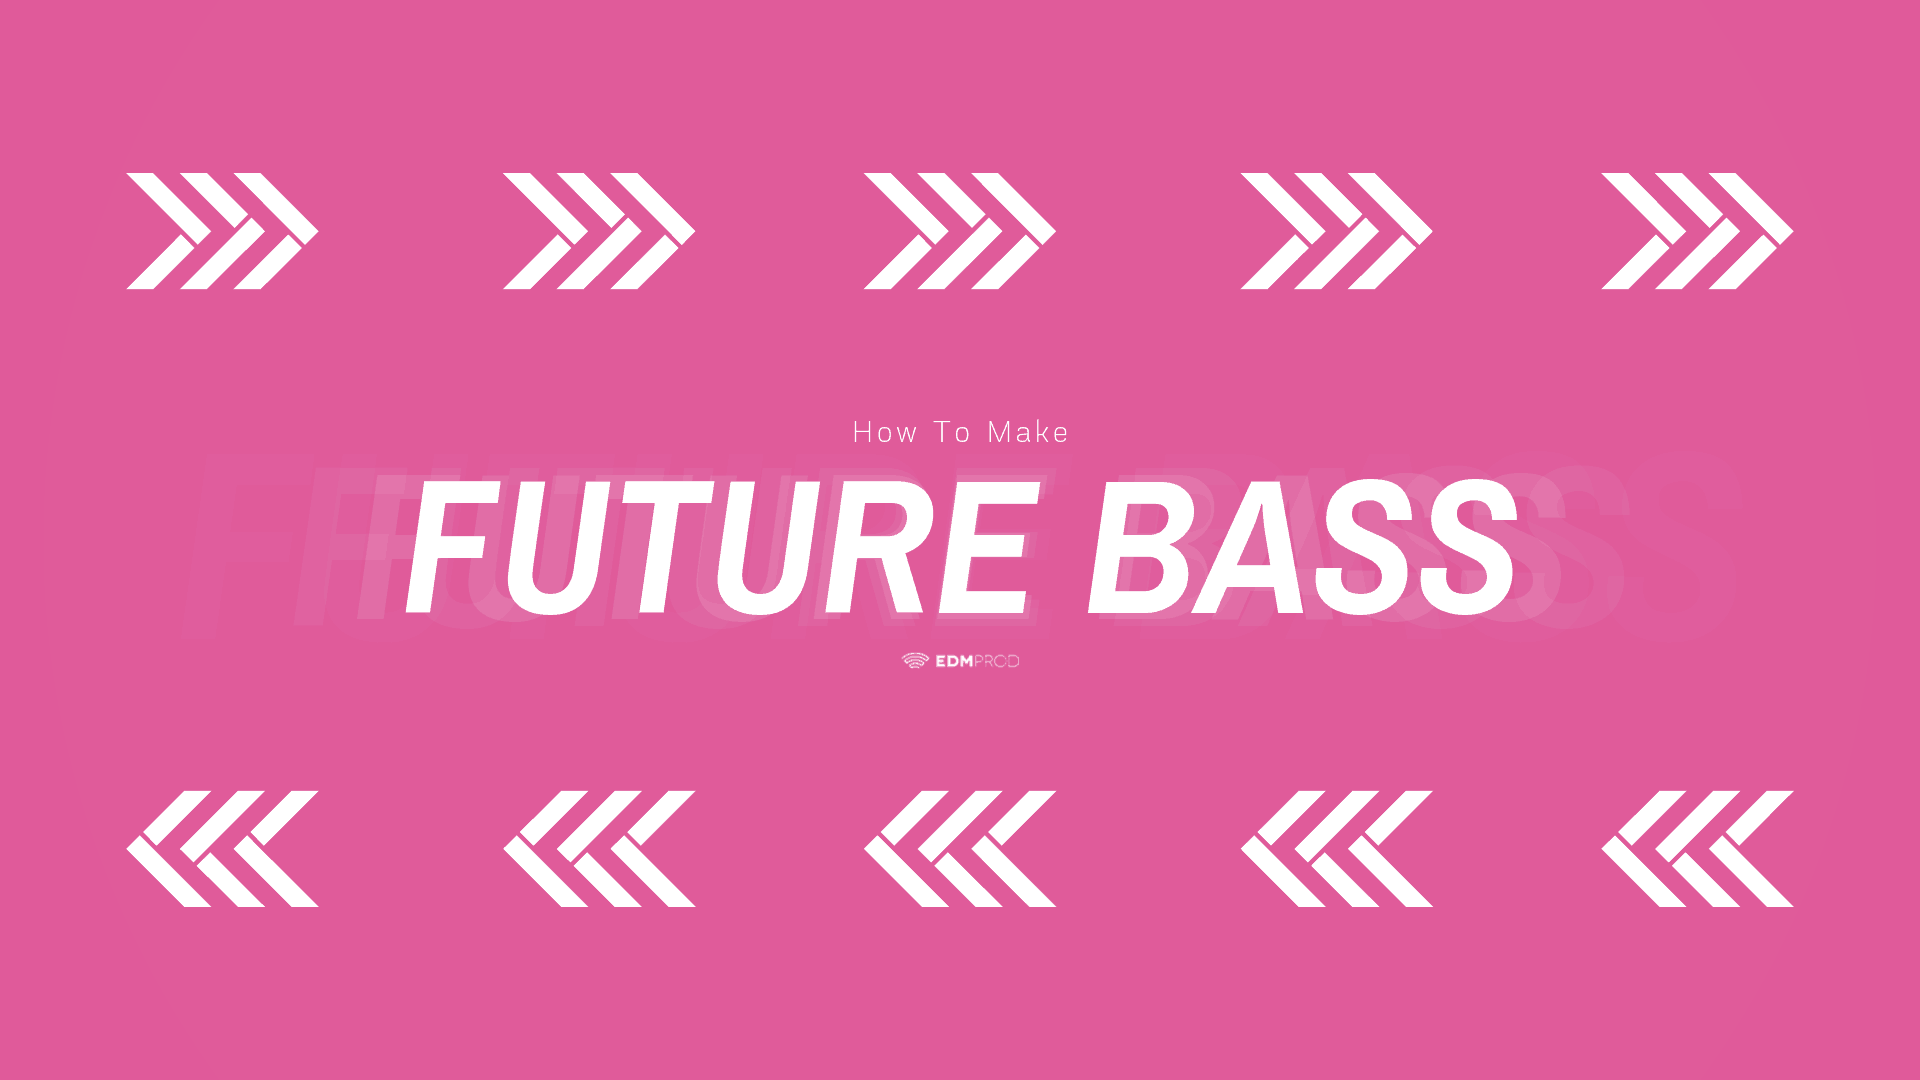 How To Make Future Bass - Header Image